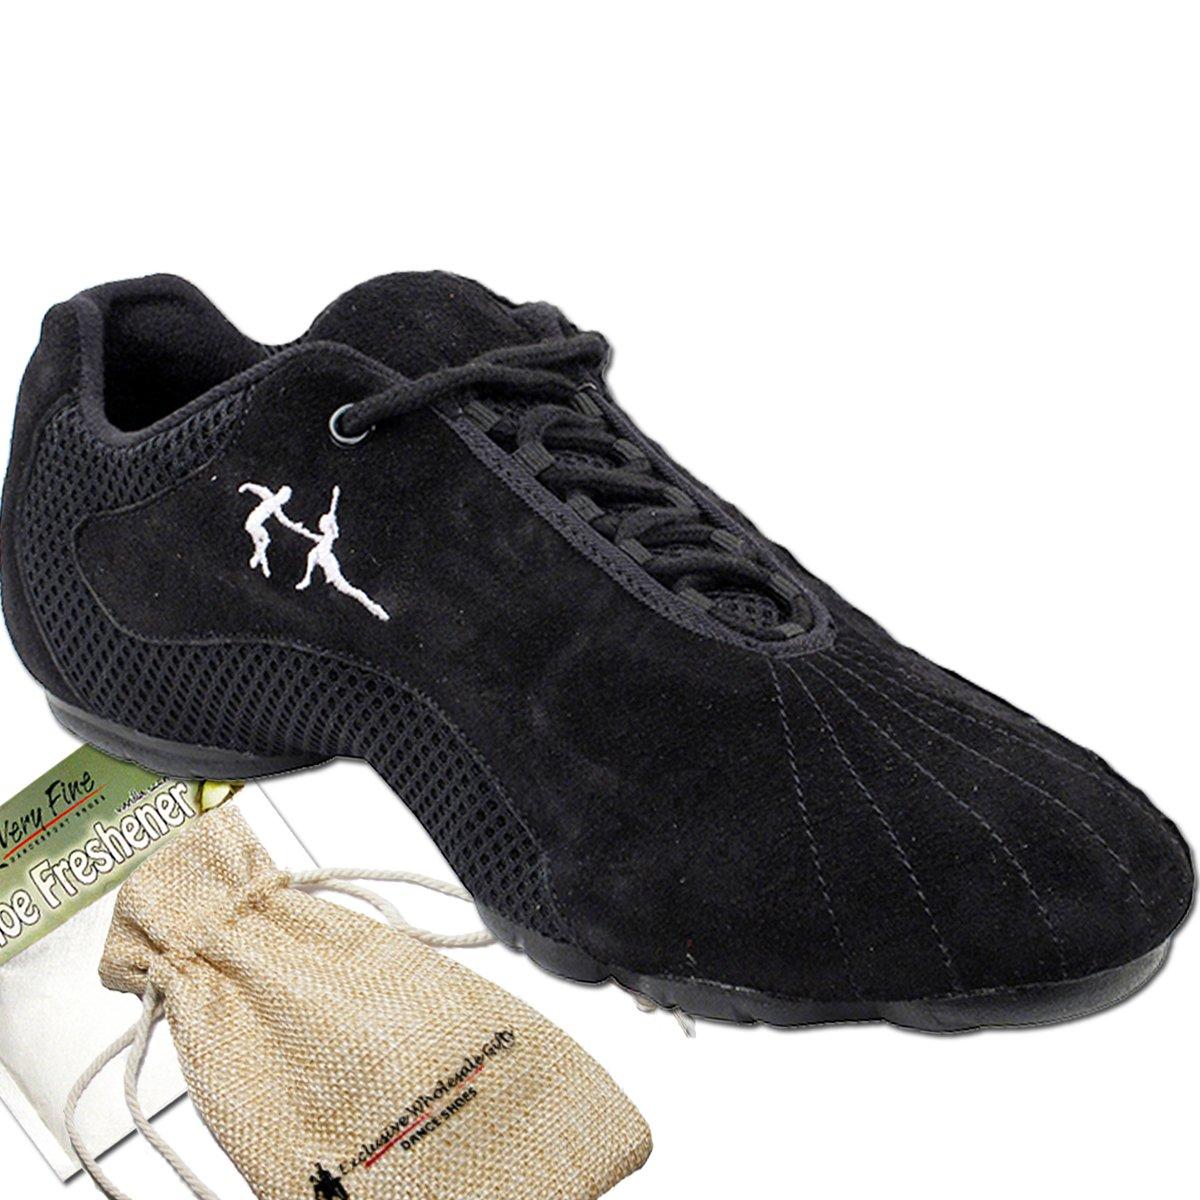 Men's Women's Unisex Practice Dance Sneaker Shoes Split Sole Black Suede VFSN016EB Comfortable - Very Fine 11 M US [Bundle of 4]